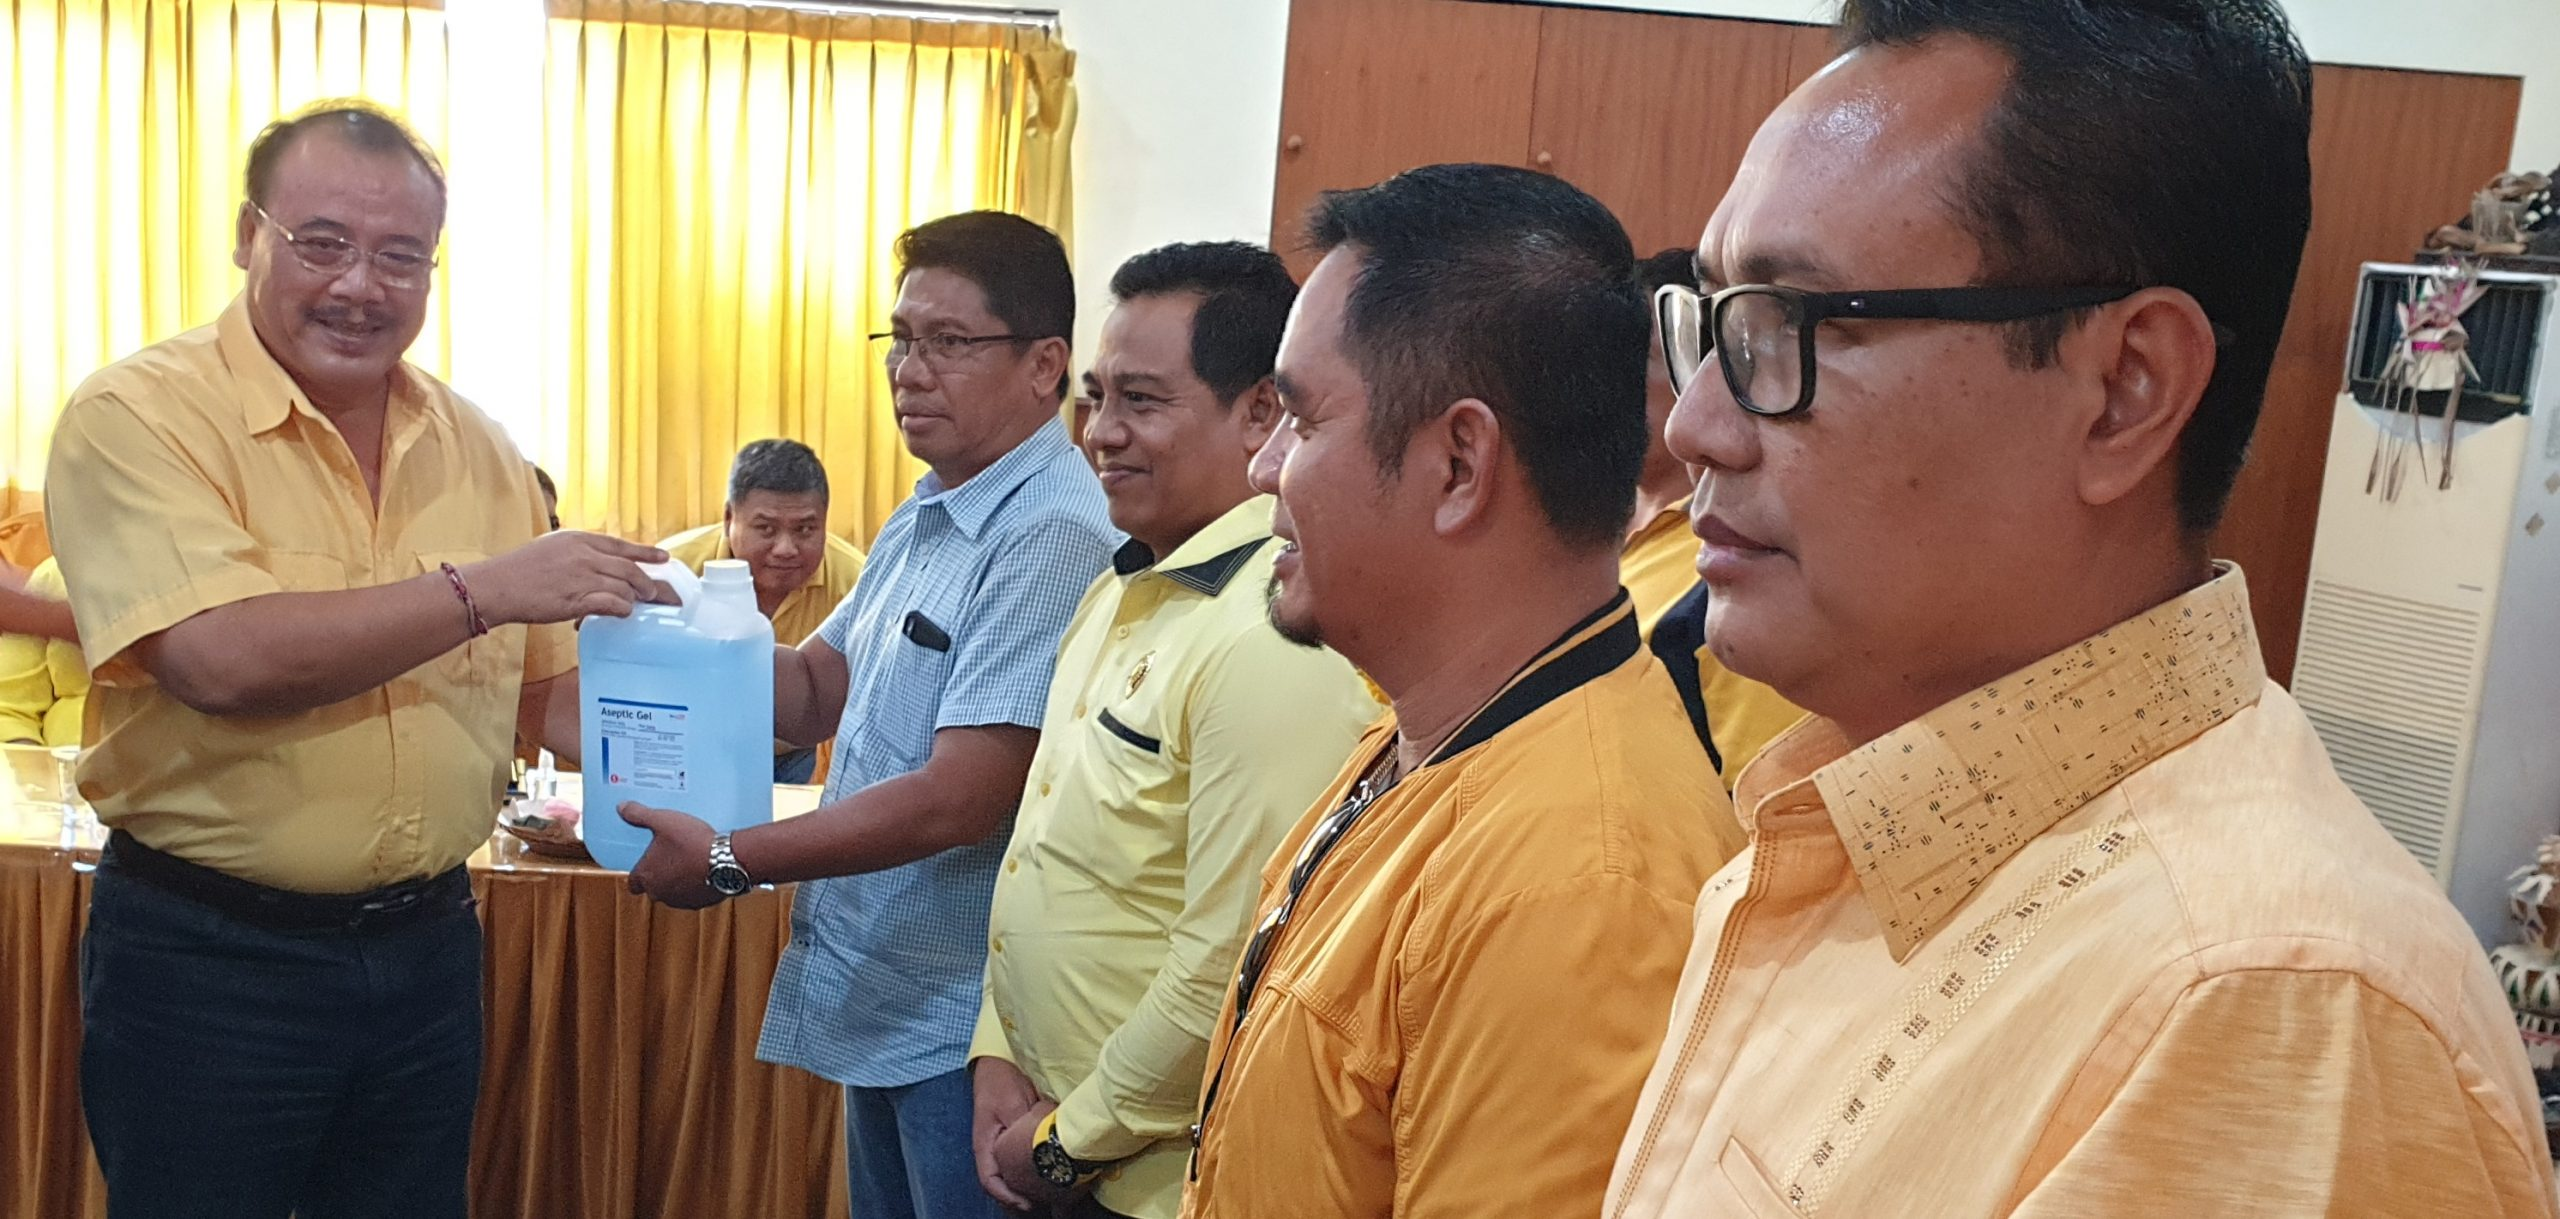 NYOMAN Sugawa Korry menyerahkan secara simbolis cairan sanitasi tangan kepada para ketua DPD Partai Golkar kabupaten/kota seluruh Bali, Minggu (15/3). Foto: gus hendra